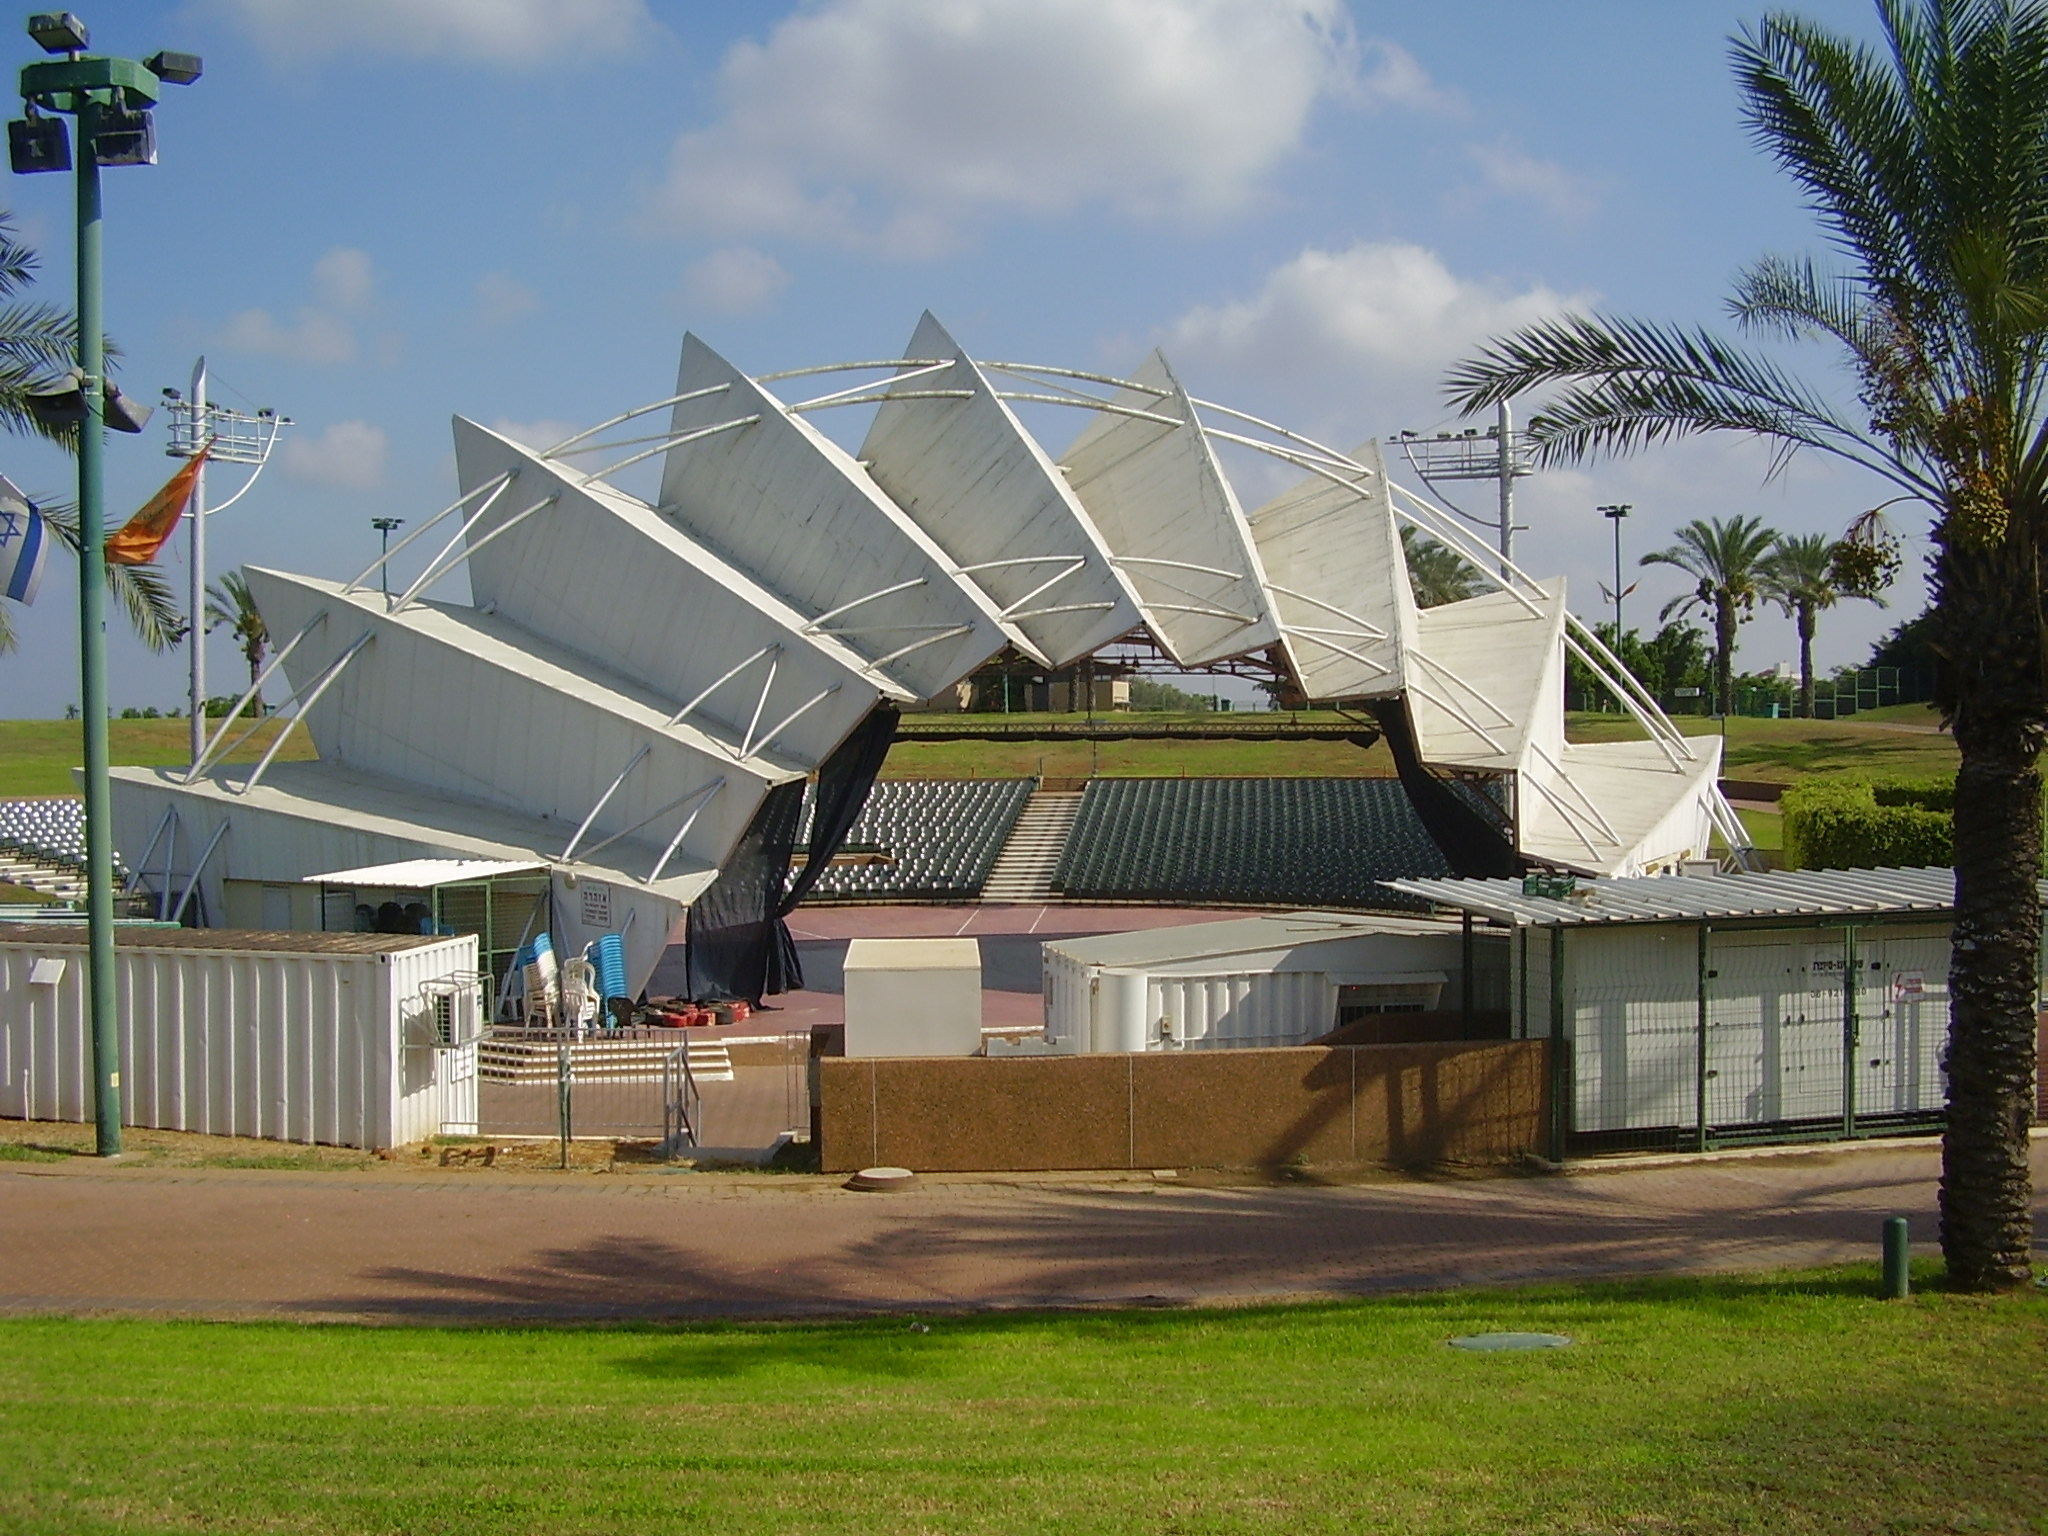 Raanana Israel  City pictures : PikiWiki Israel 14257 Raanana Park Amphitheater Wikimedia ...